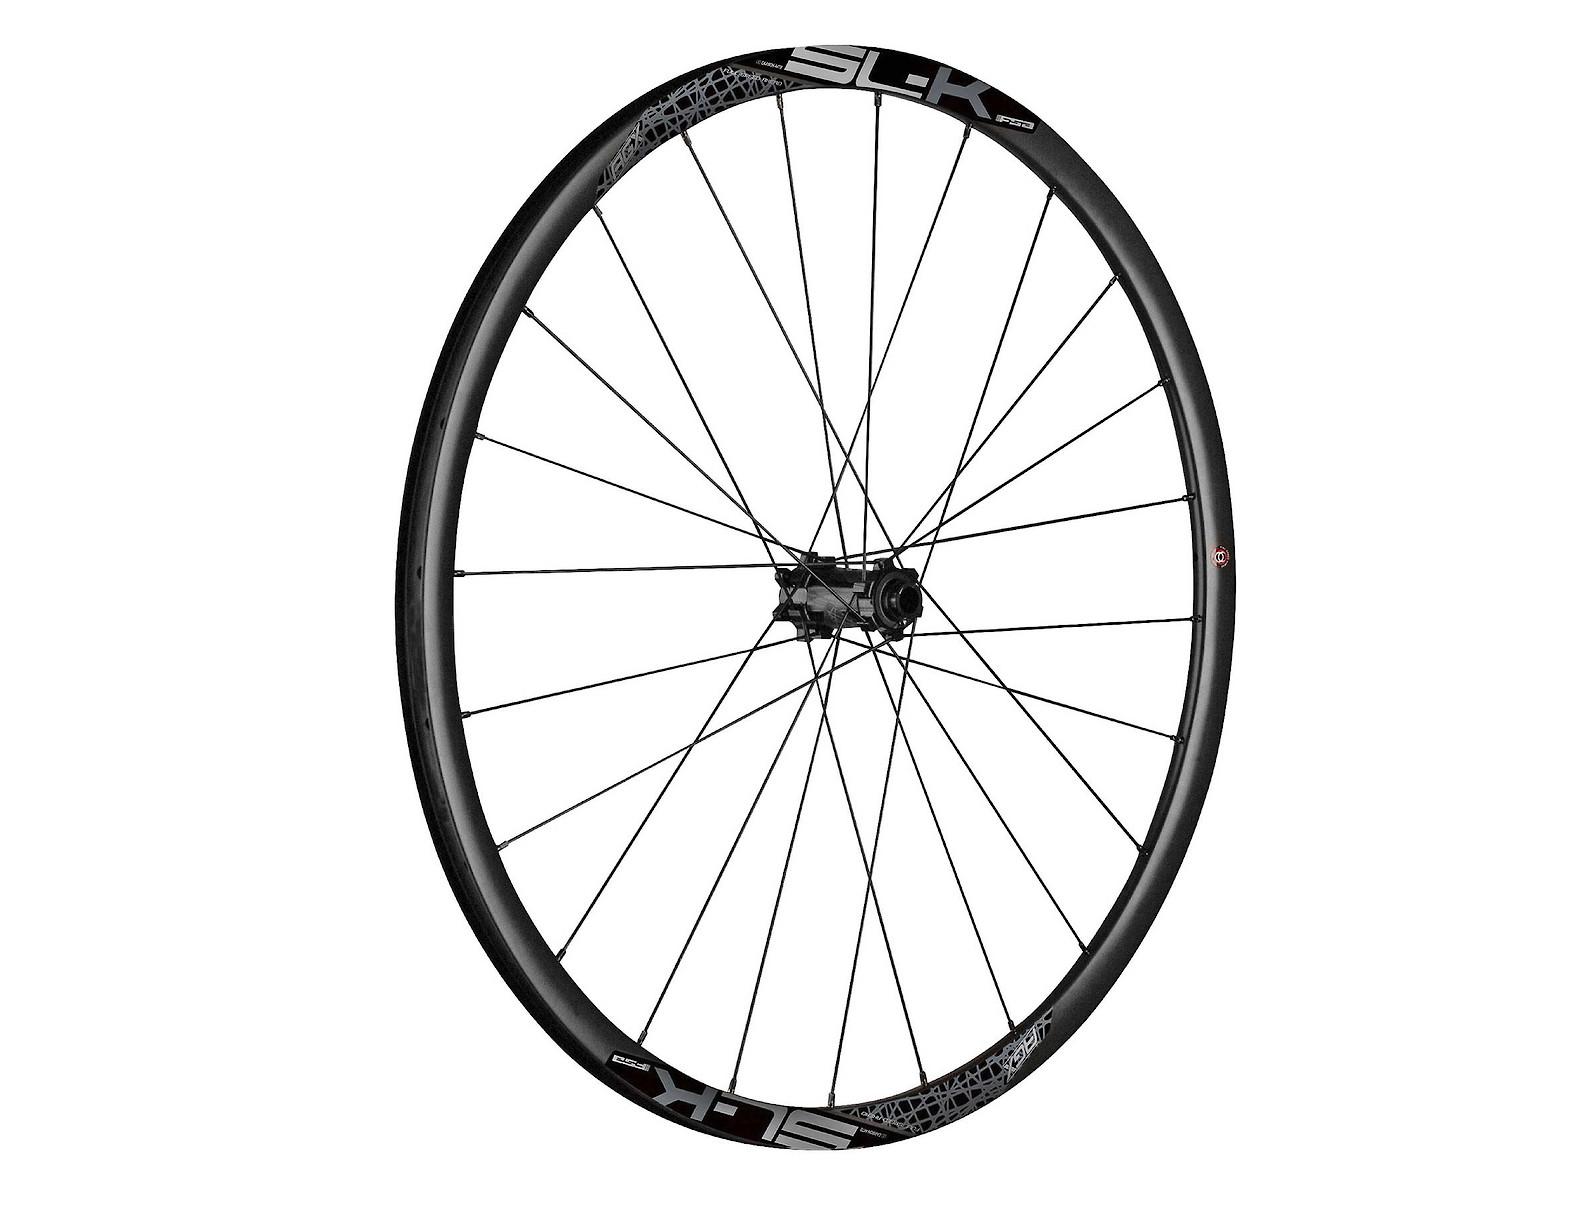 SL-K AGX Carbon Front Wheel